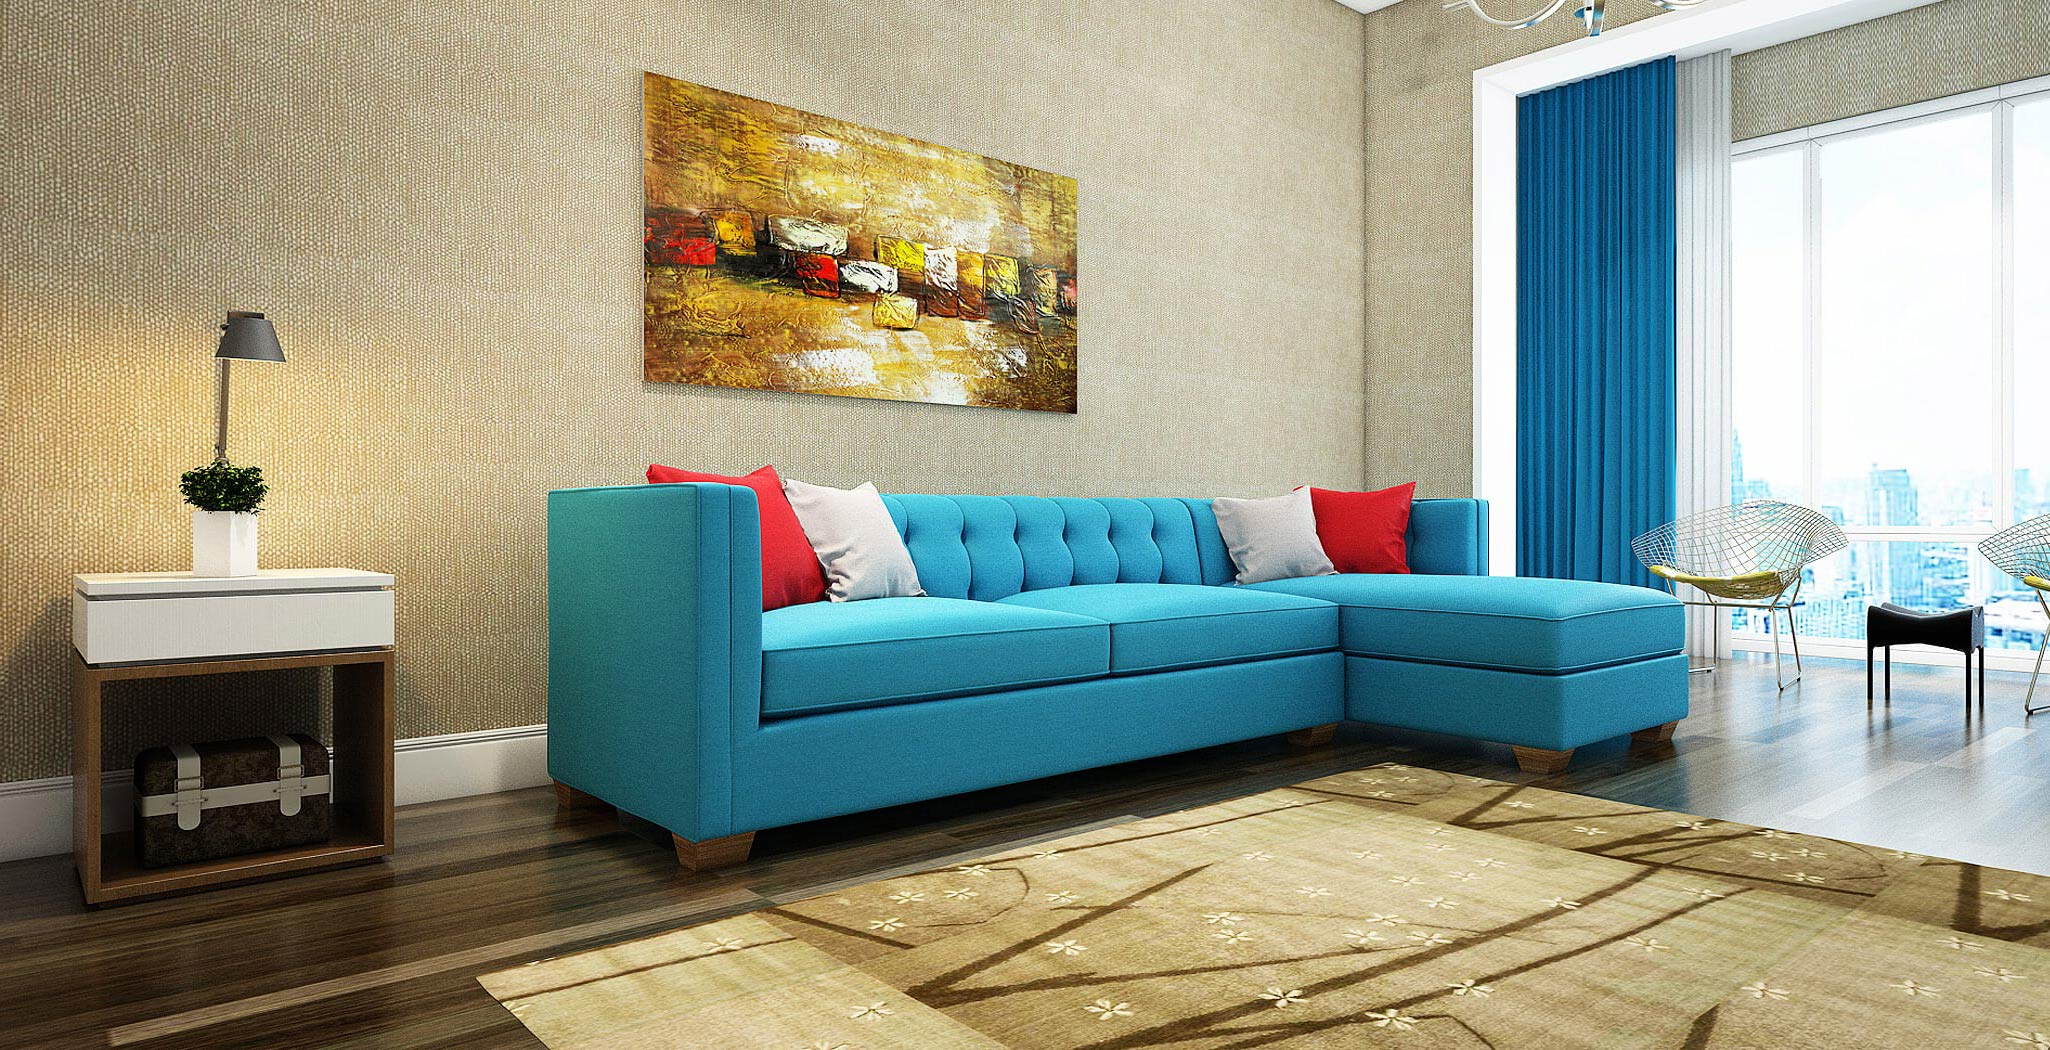 grant panel furniture gallery 5